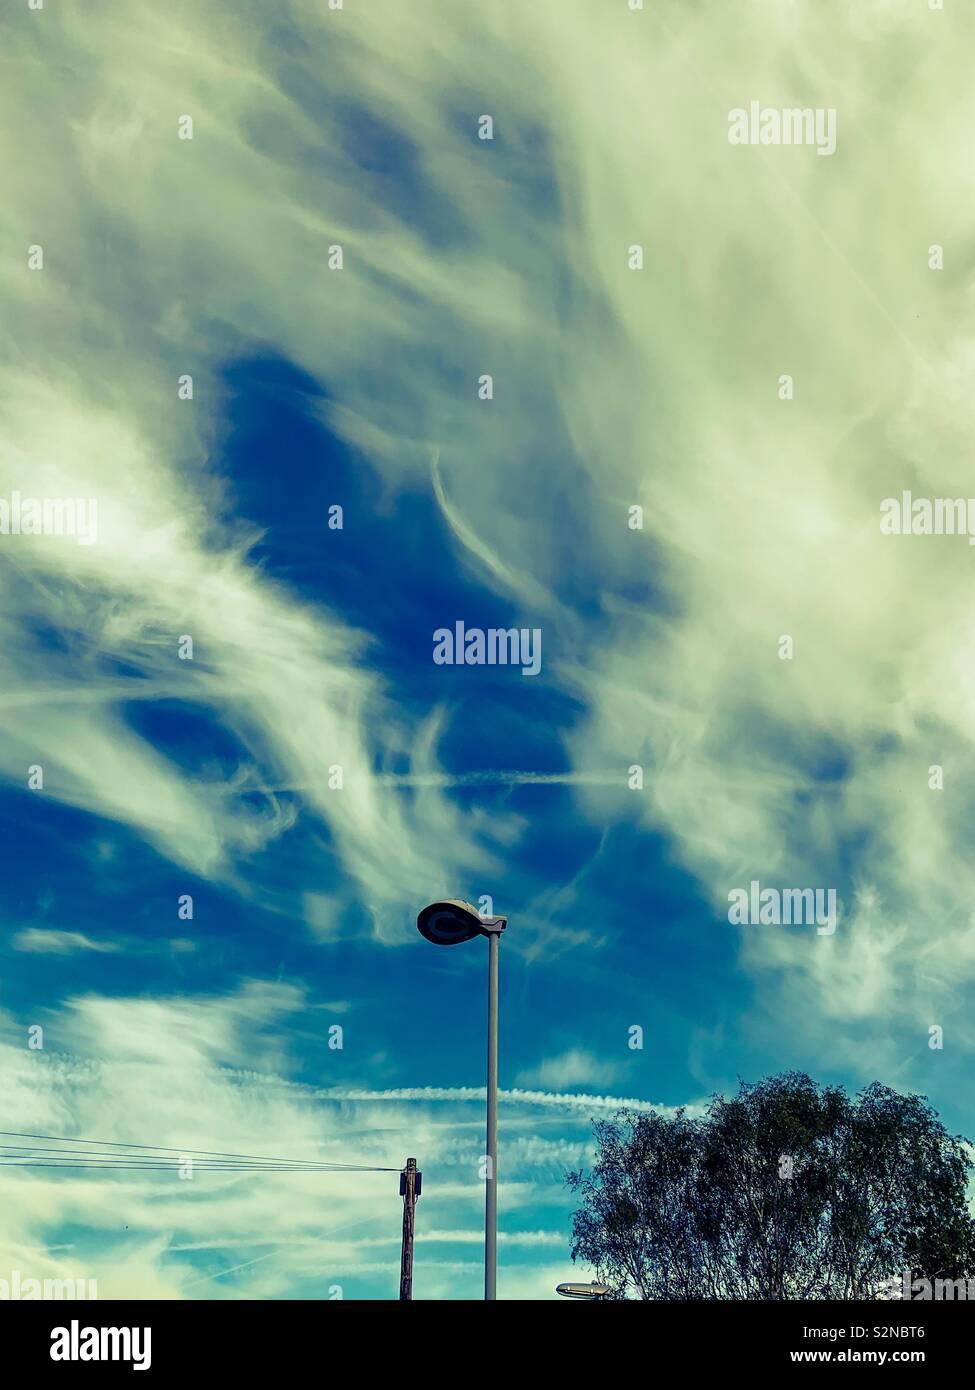 CCTV on a wispy cloud sky - Stock Image